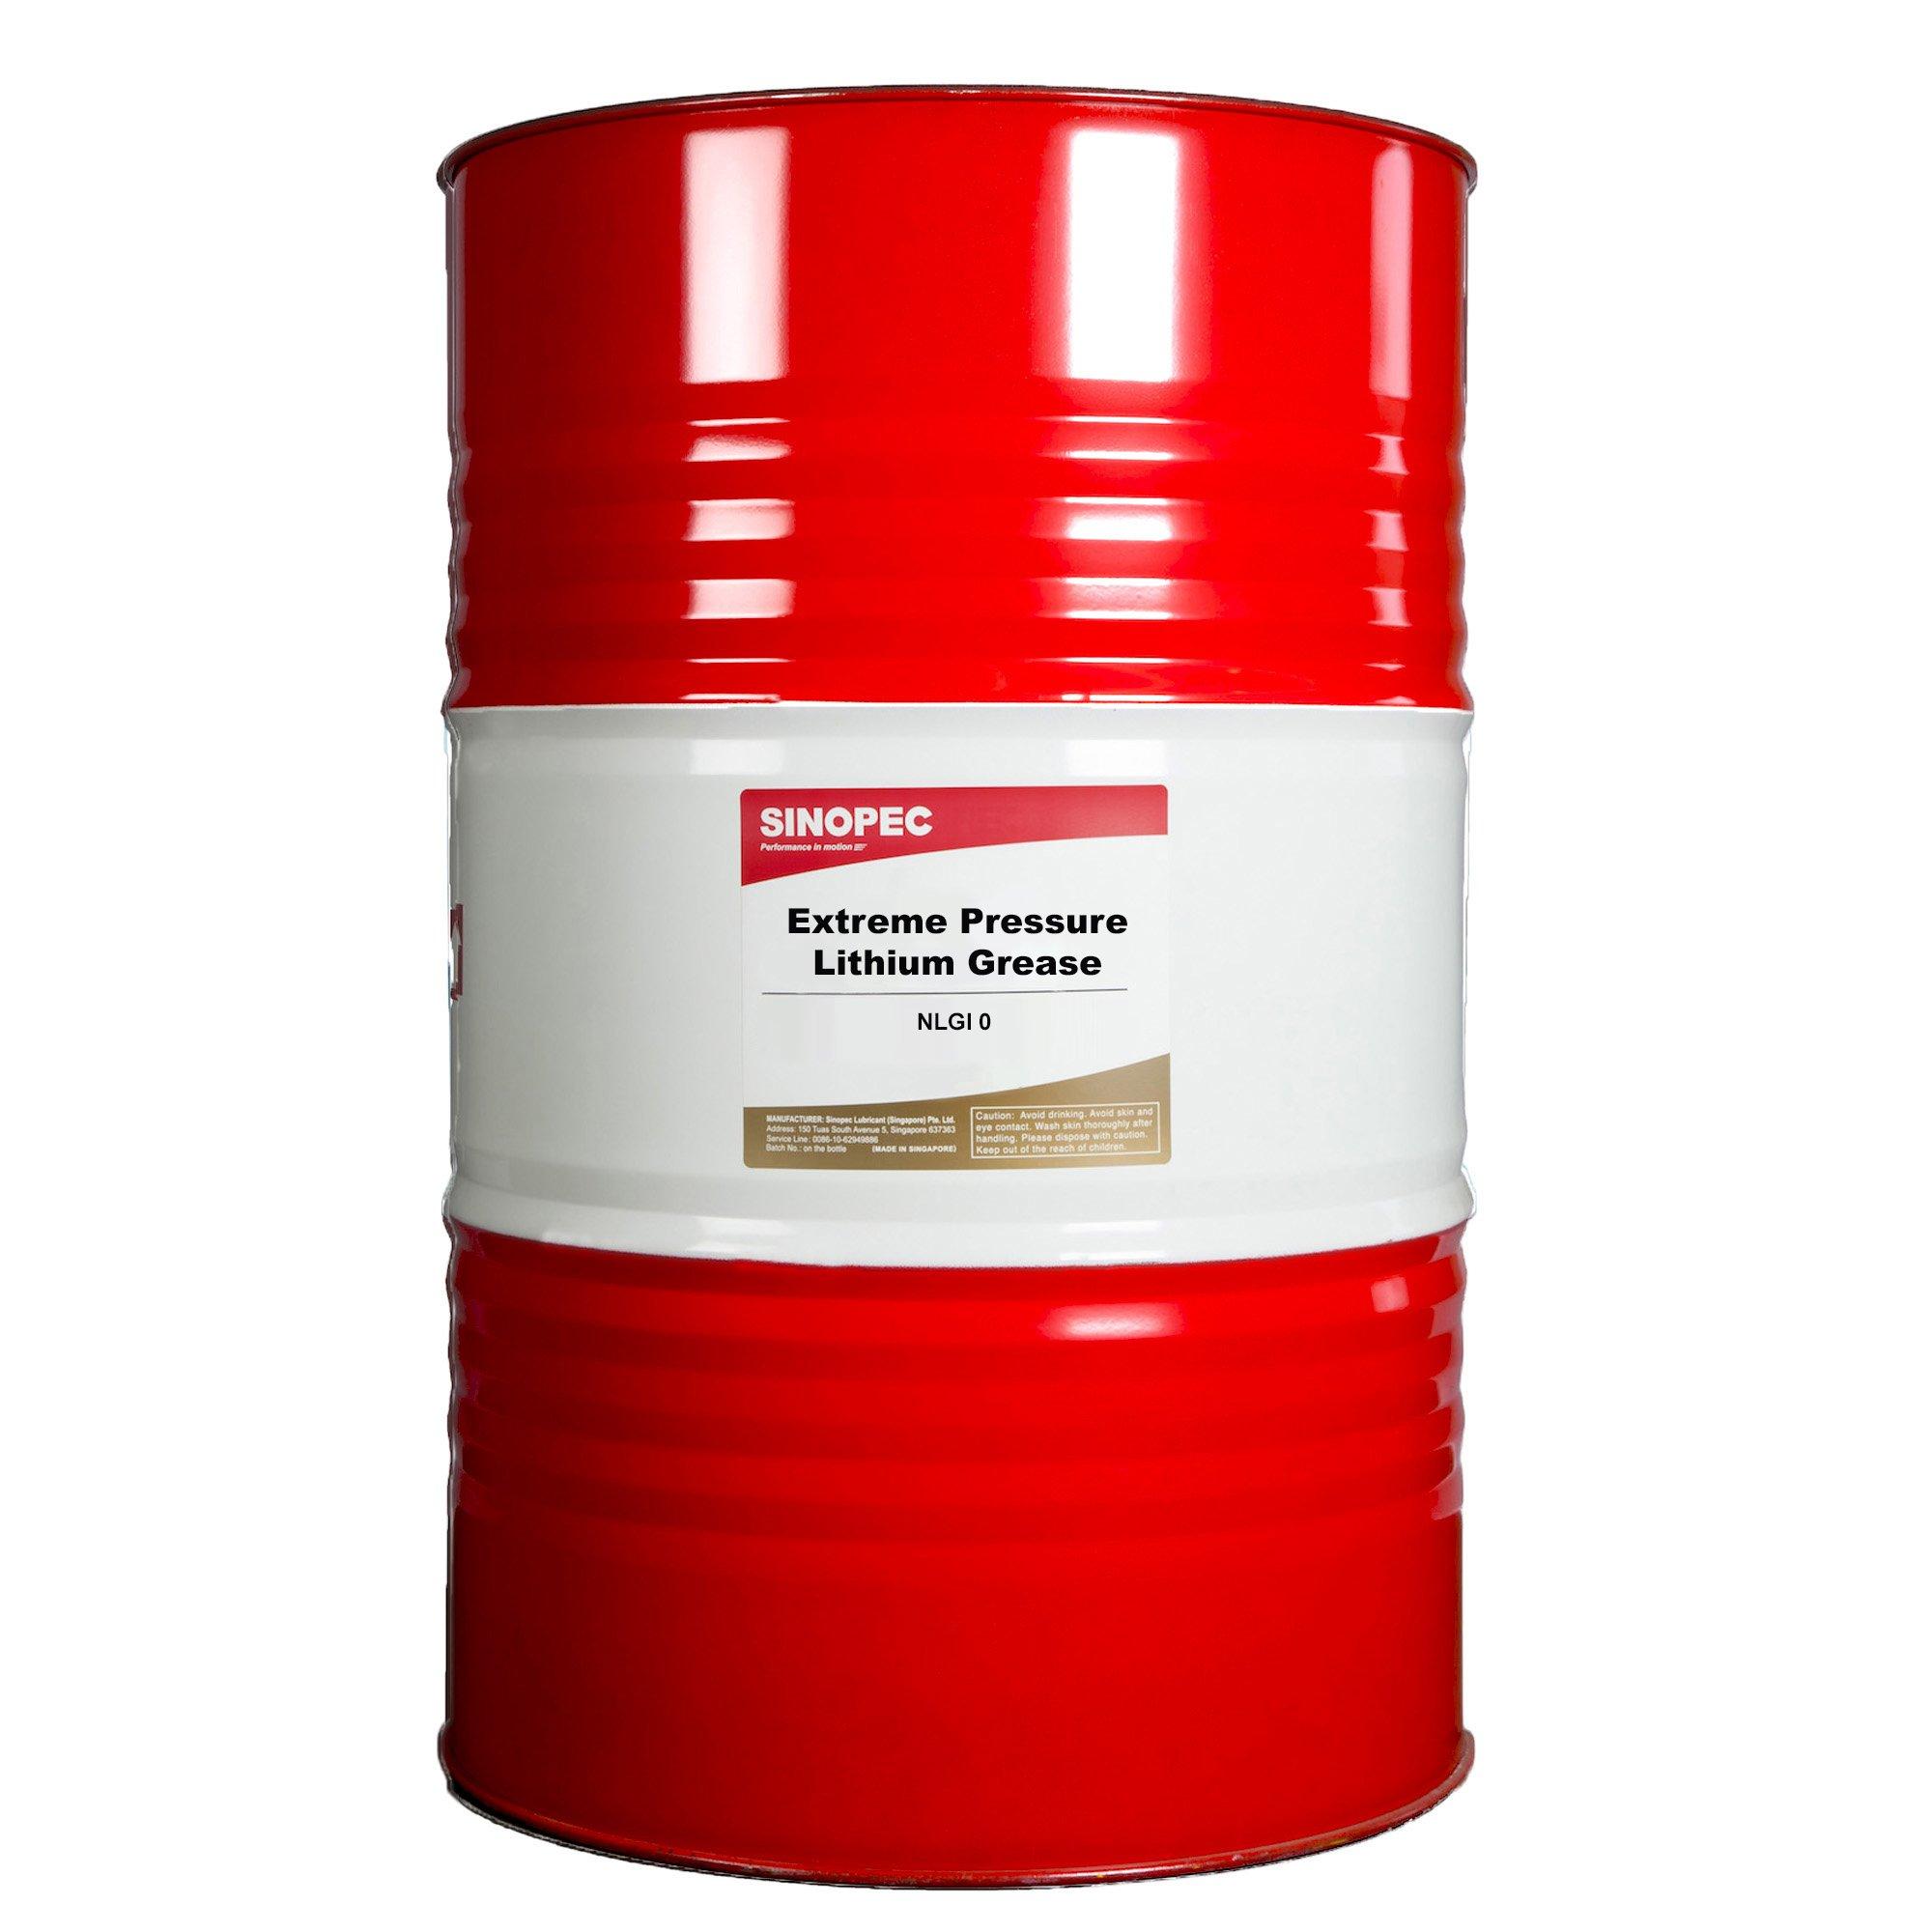 Sinopec EP0 Extreme Pressure Lithium Grease, Nlgi 0, 400 lb.